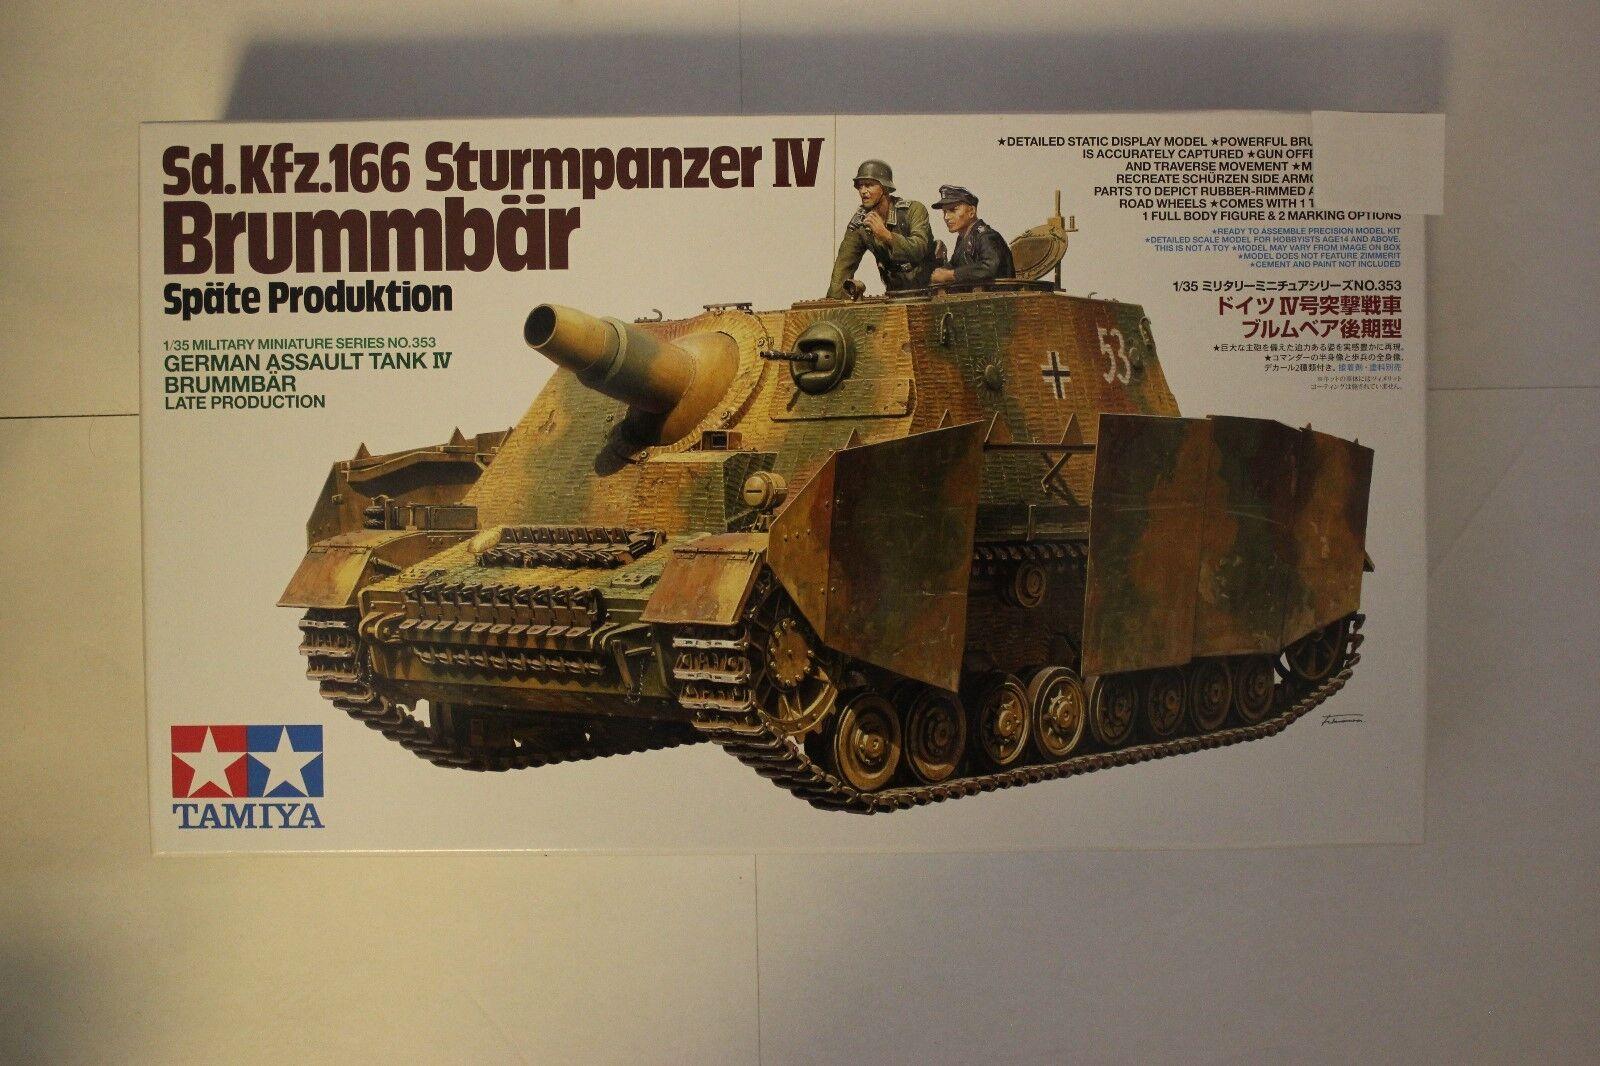 TAMIYA 35353 Sd.kfz.166 Sturmpanzer IV 'Brummbar' 1 35 Tank Model Kit